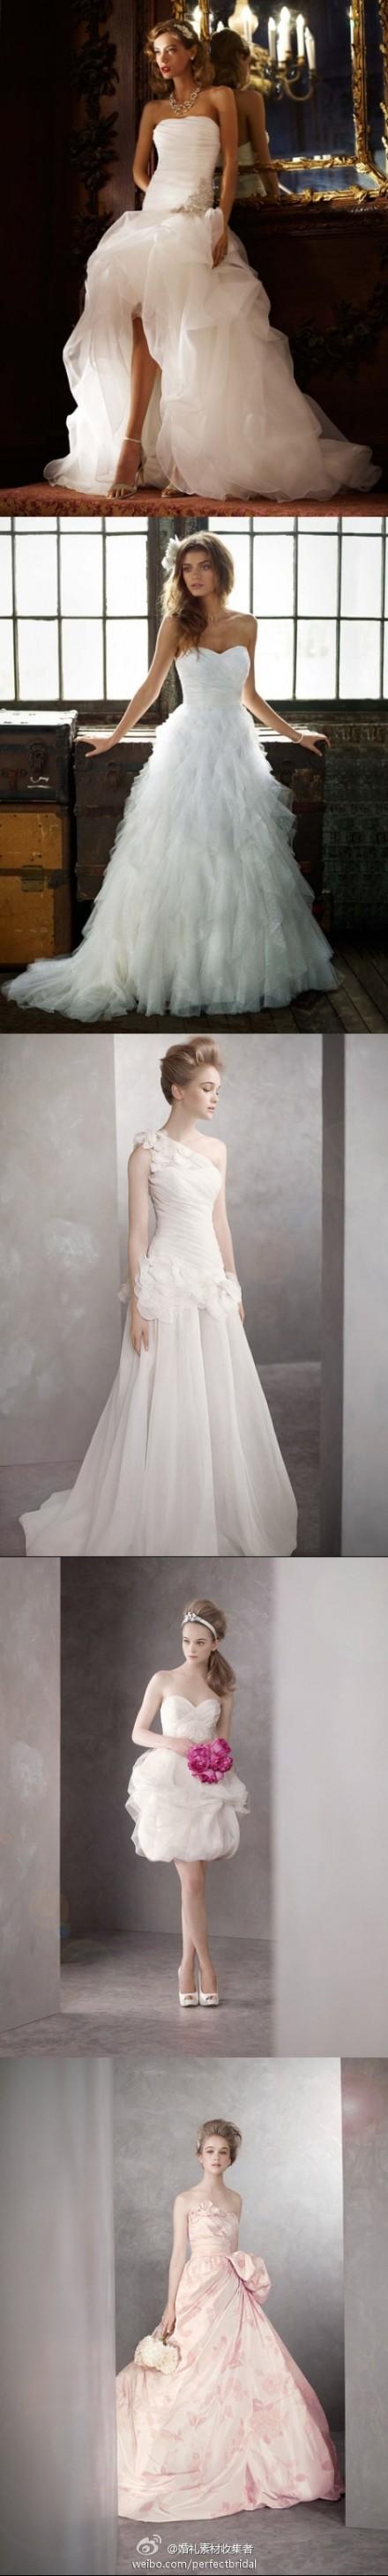 Love the rd one Wedding uc Pinterest Wedding dress Wedding